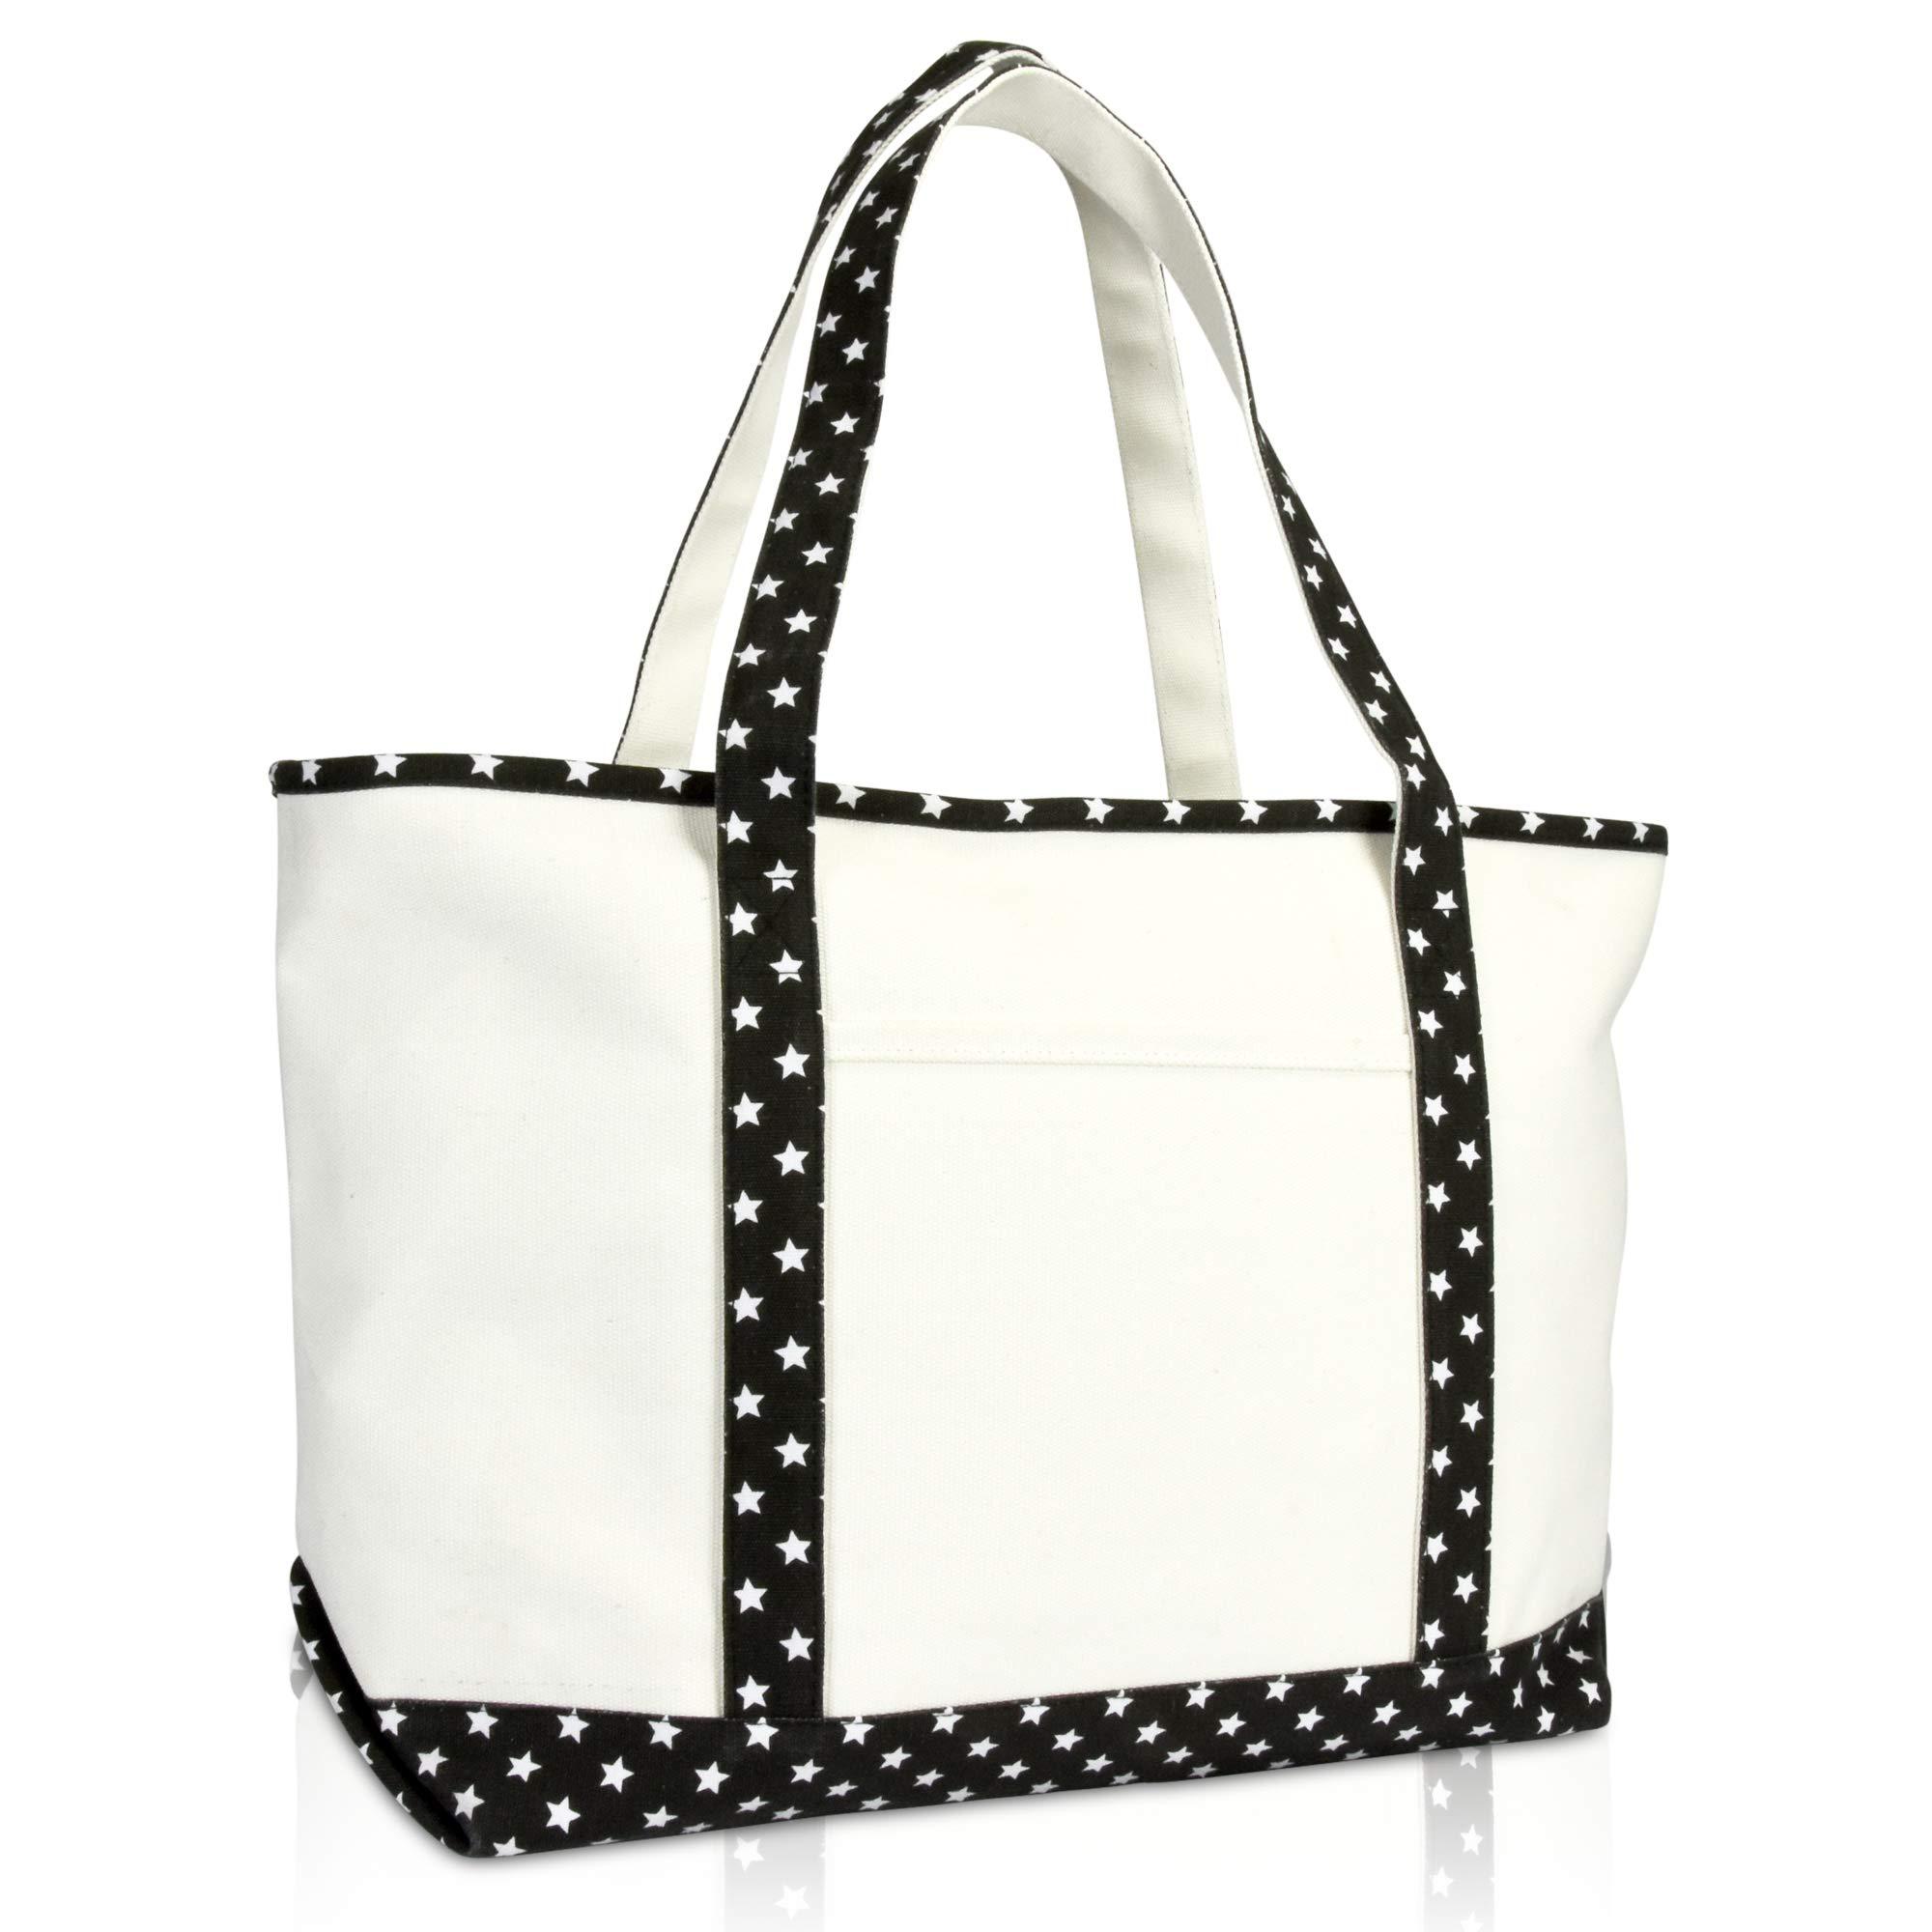 DALIX 23'' Premium 24 oz. Cotton Canvas Shopping Tote Black Star by DALIX (Image #1)